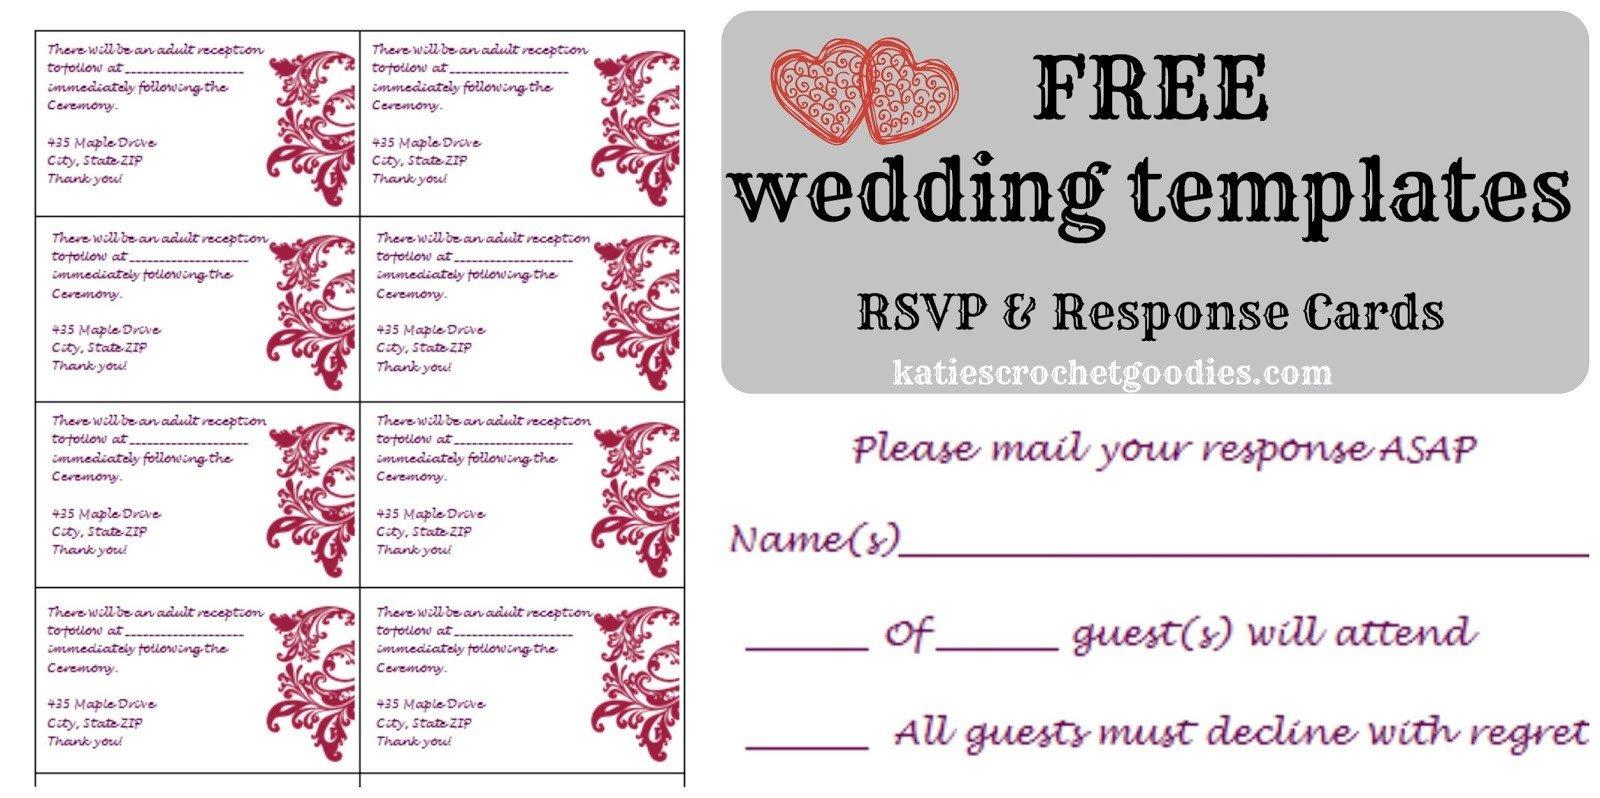 Wedding Rsvp Cards Templates Free Wedding Templates Rsvp & Reception Cards Katie S